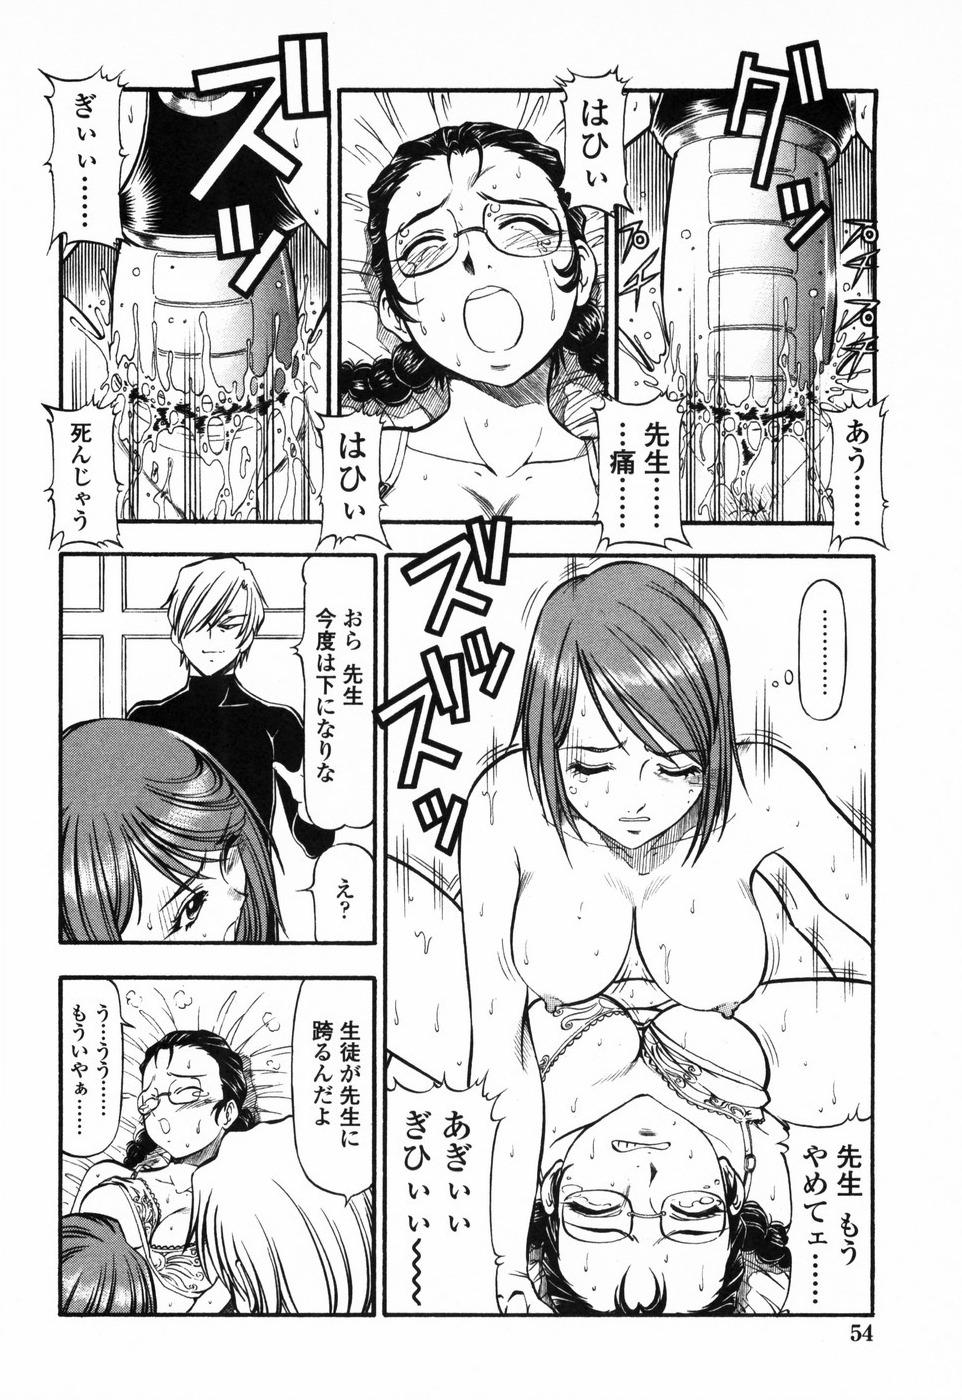 Kichiku Houteishiki - Equation of brutal person 59